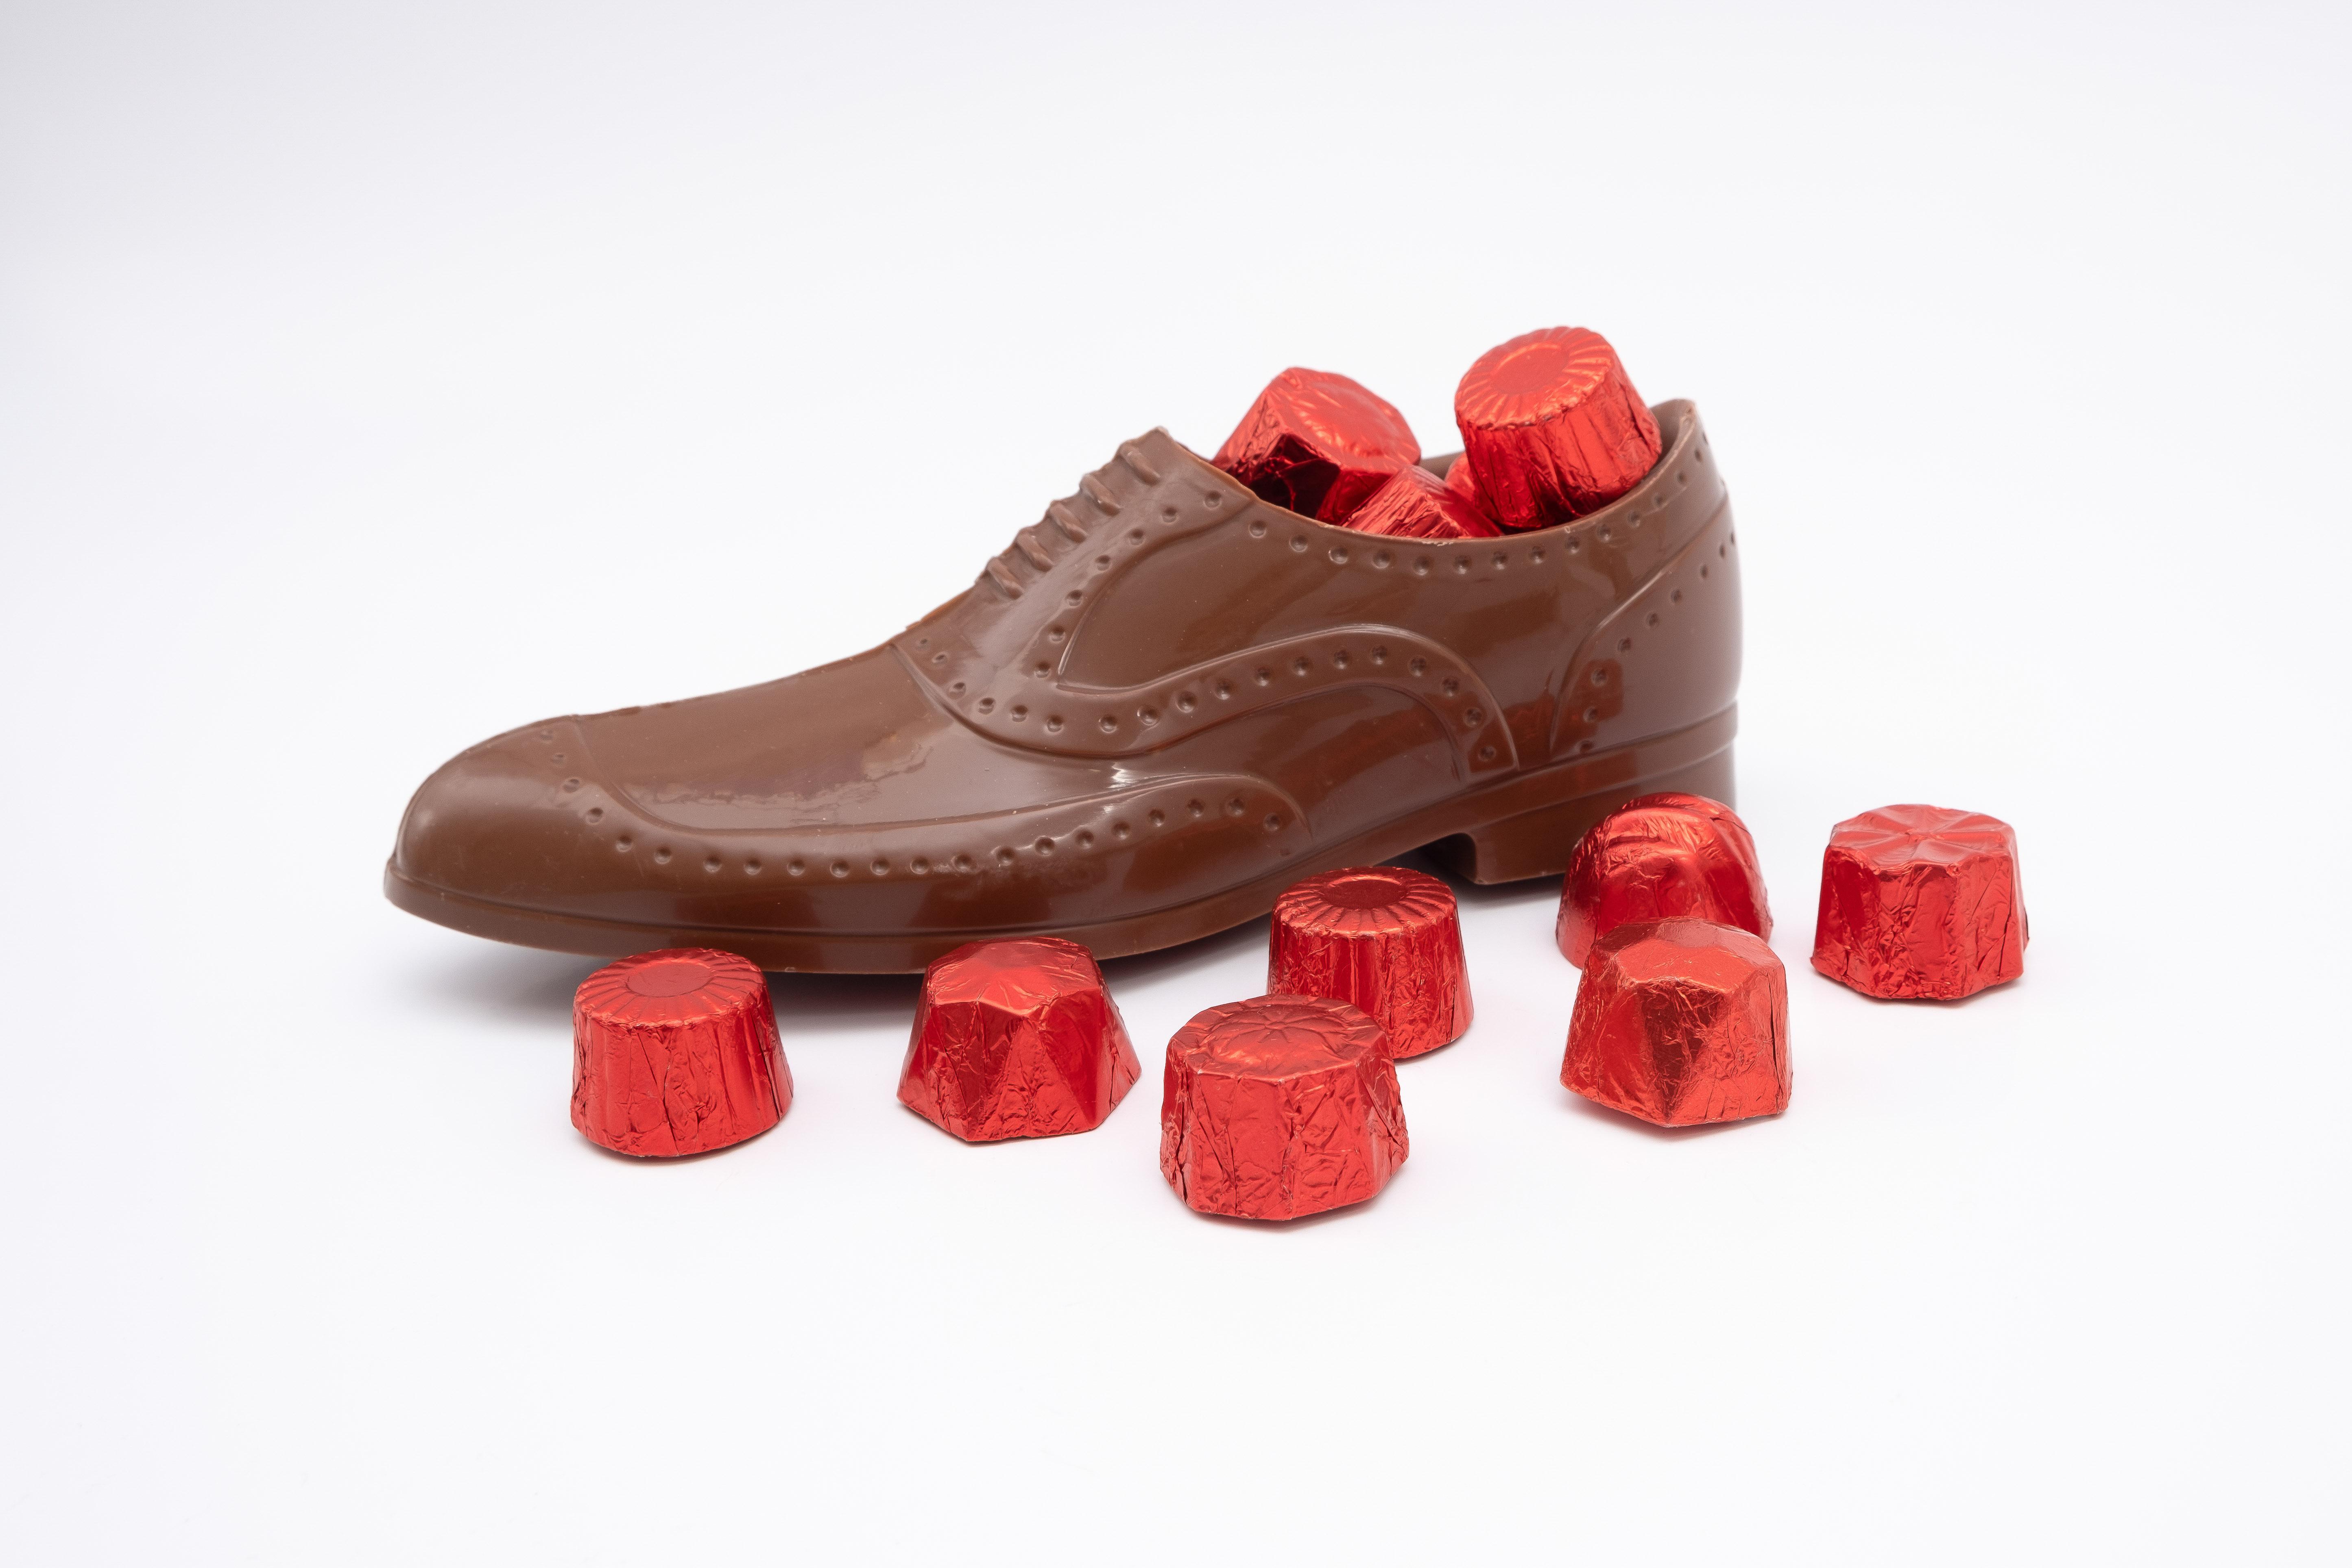 Zapato hombre + 10 bombones